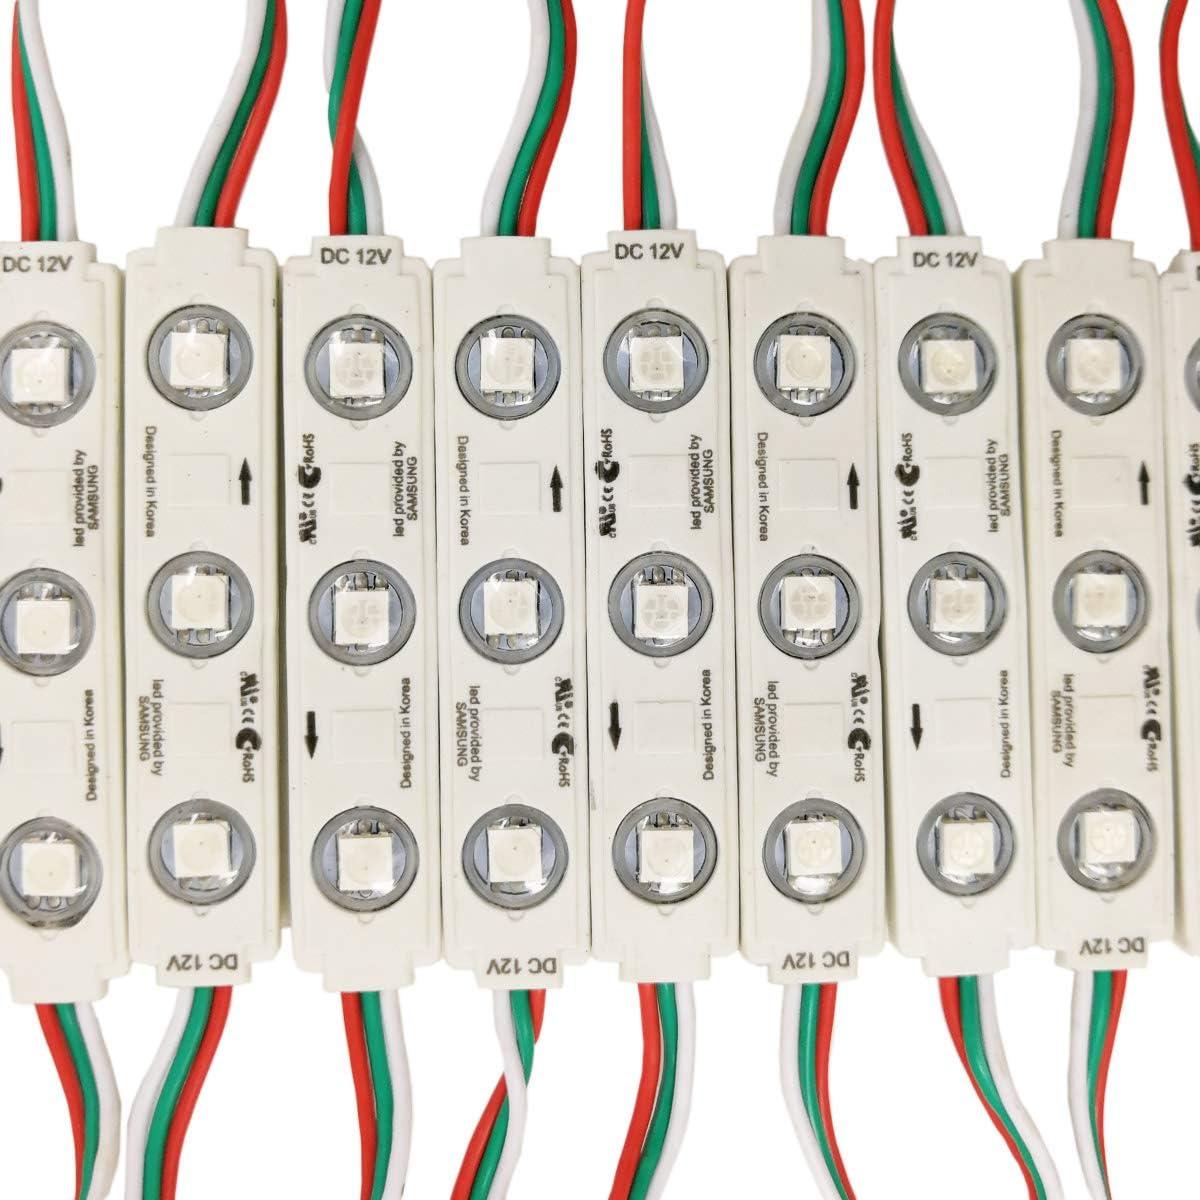 YUNBO Pack 20Pcs WS2811 LED Module Lights 0.72W SMD 5050 Addressable Dream Color DC 12V RGB LED Module Waterproof IP65 LED Storefront Lights with Mini RF 14Keys WS2811 LED Controller